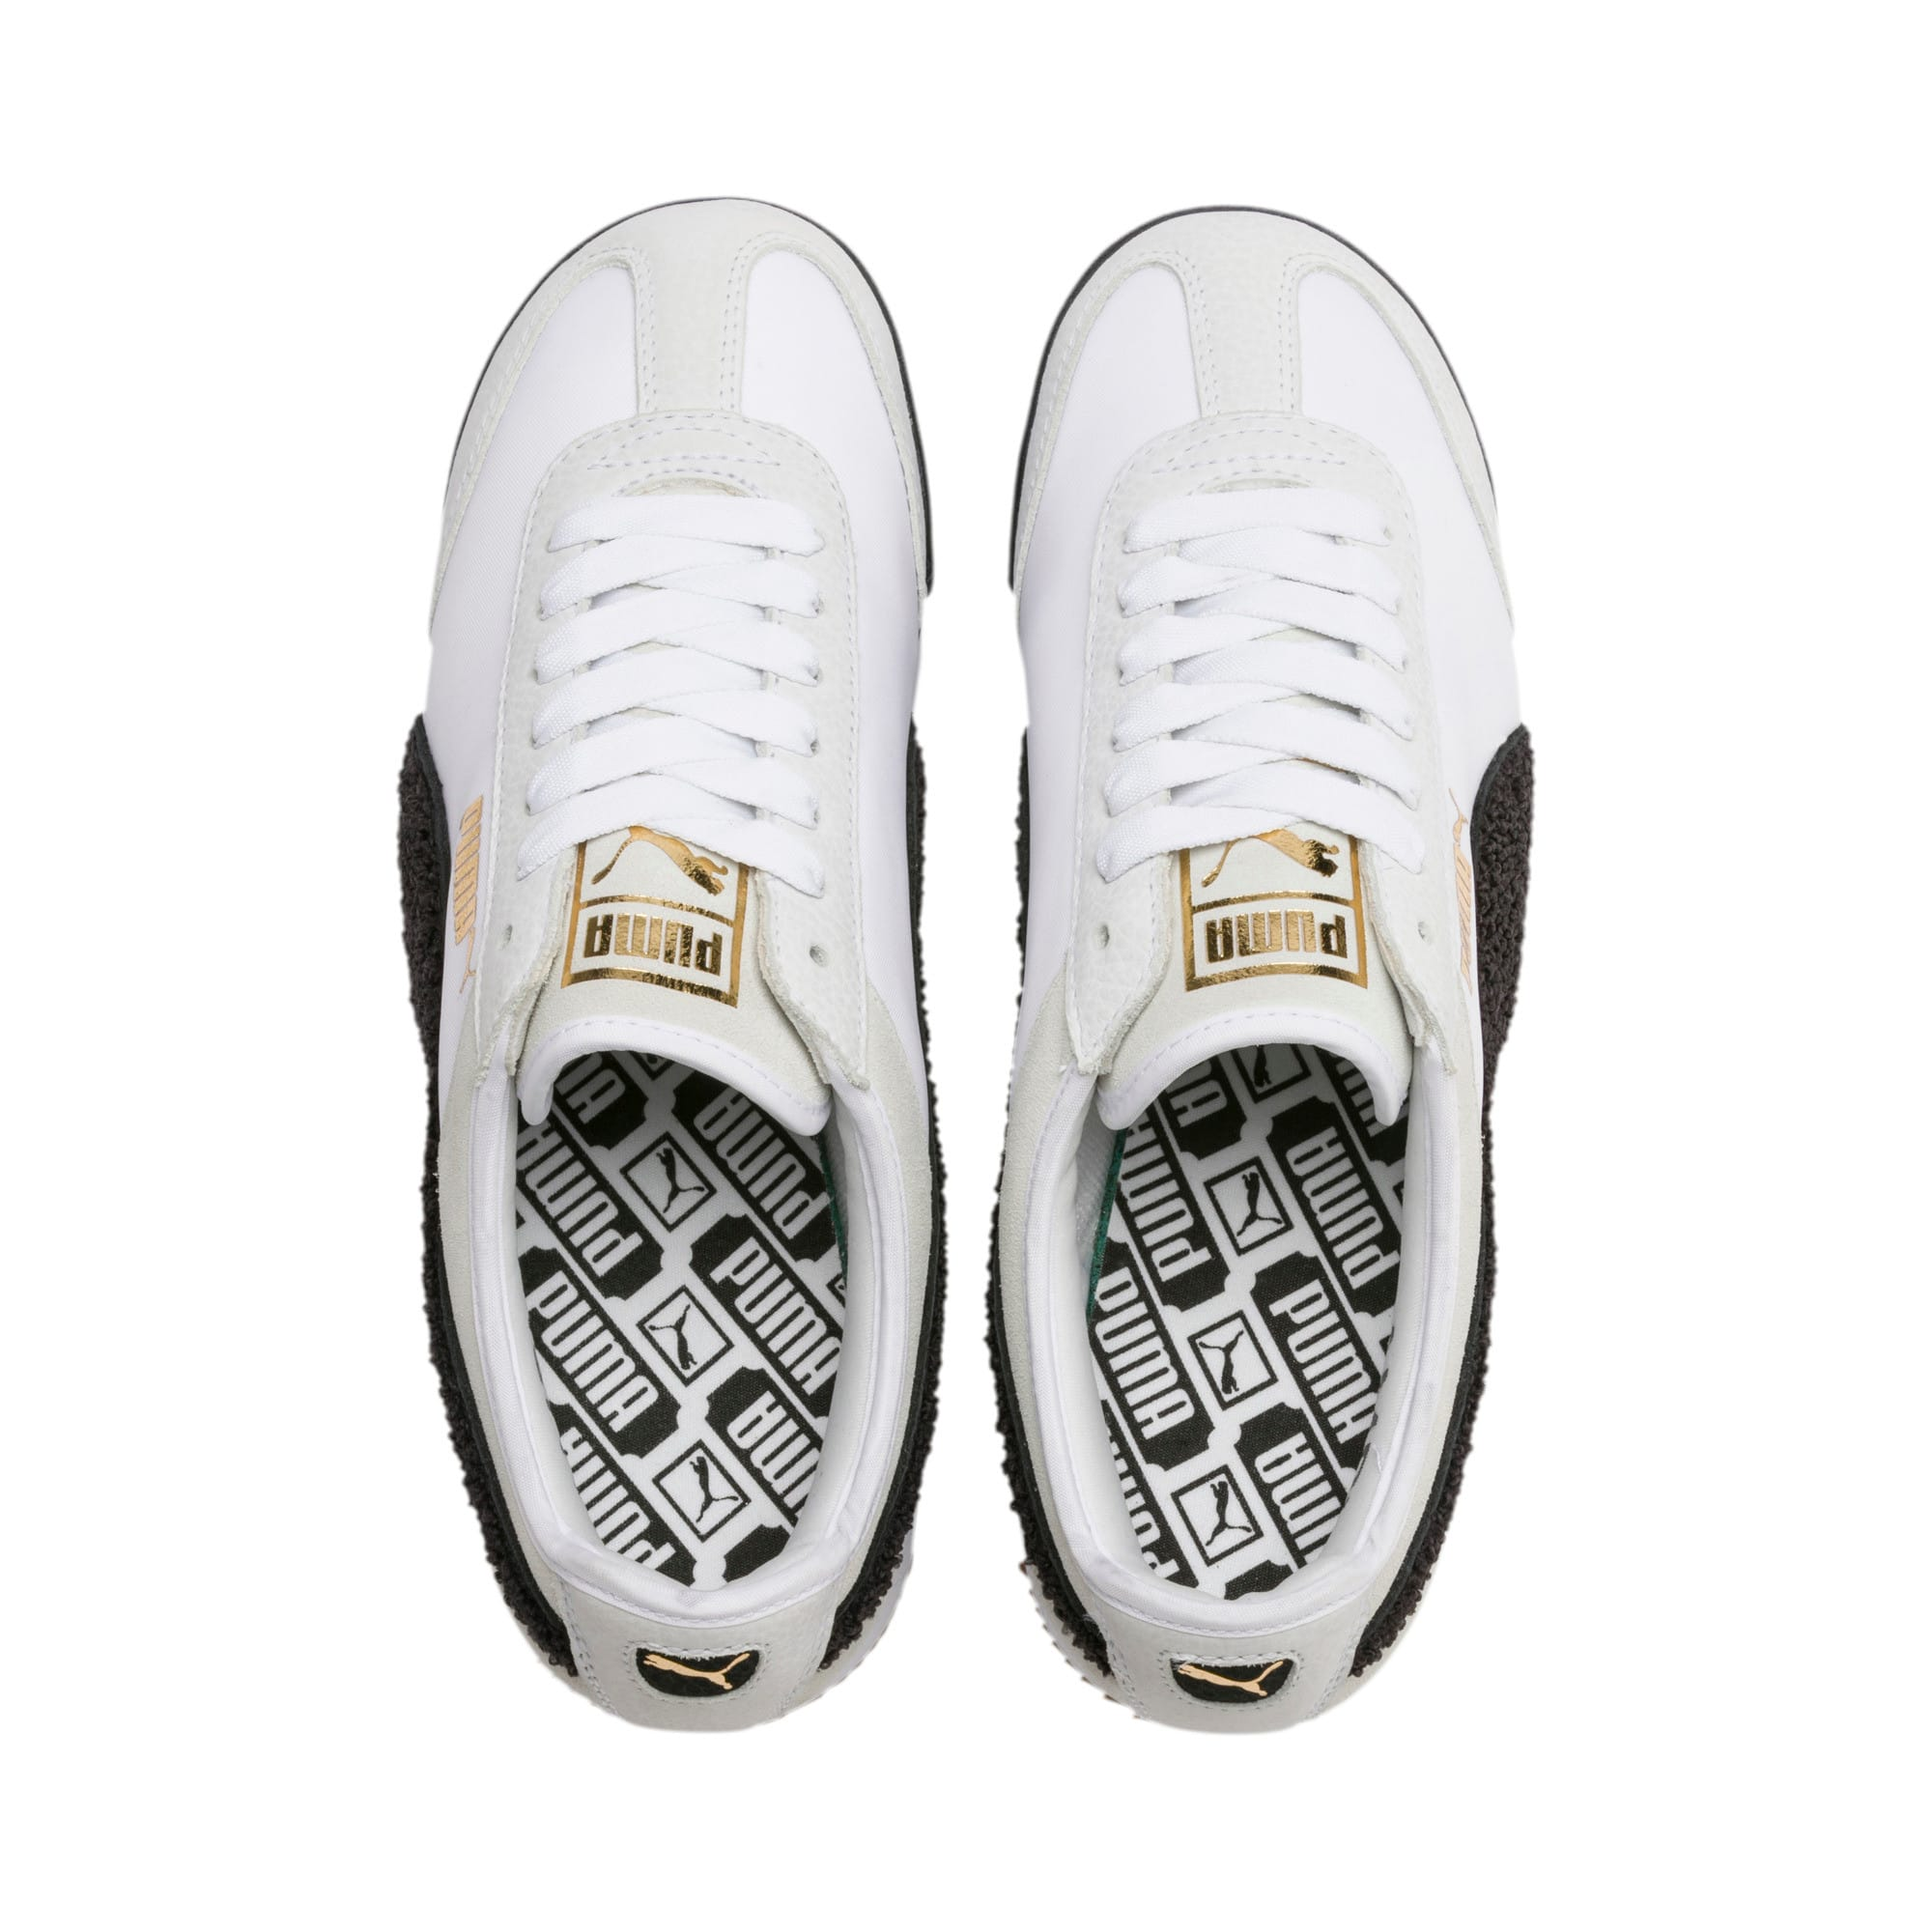 Thumbnail 8 of Roma Amor Heritage Women's Sneakers, Puma White-Puma Black, medium